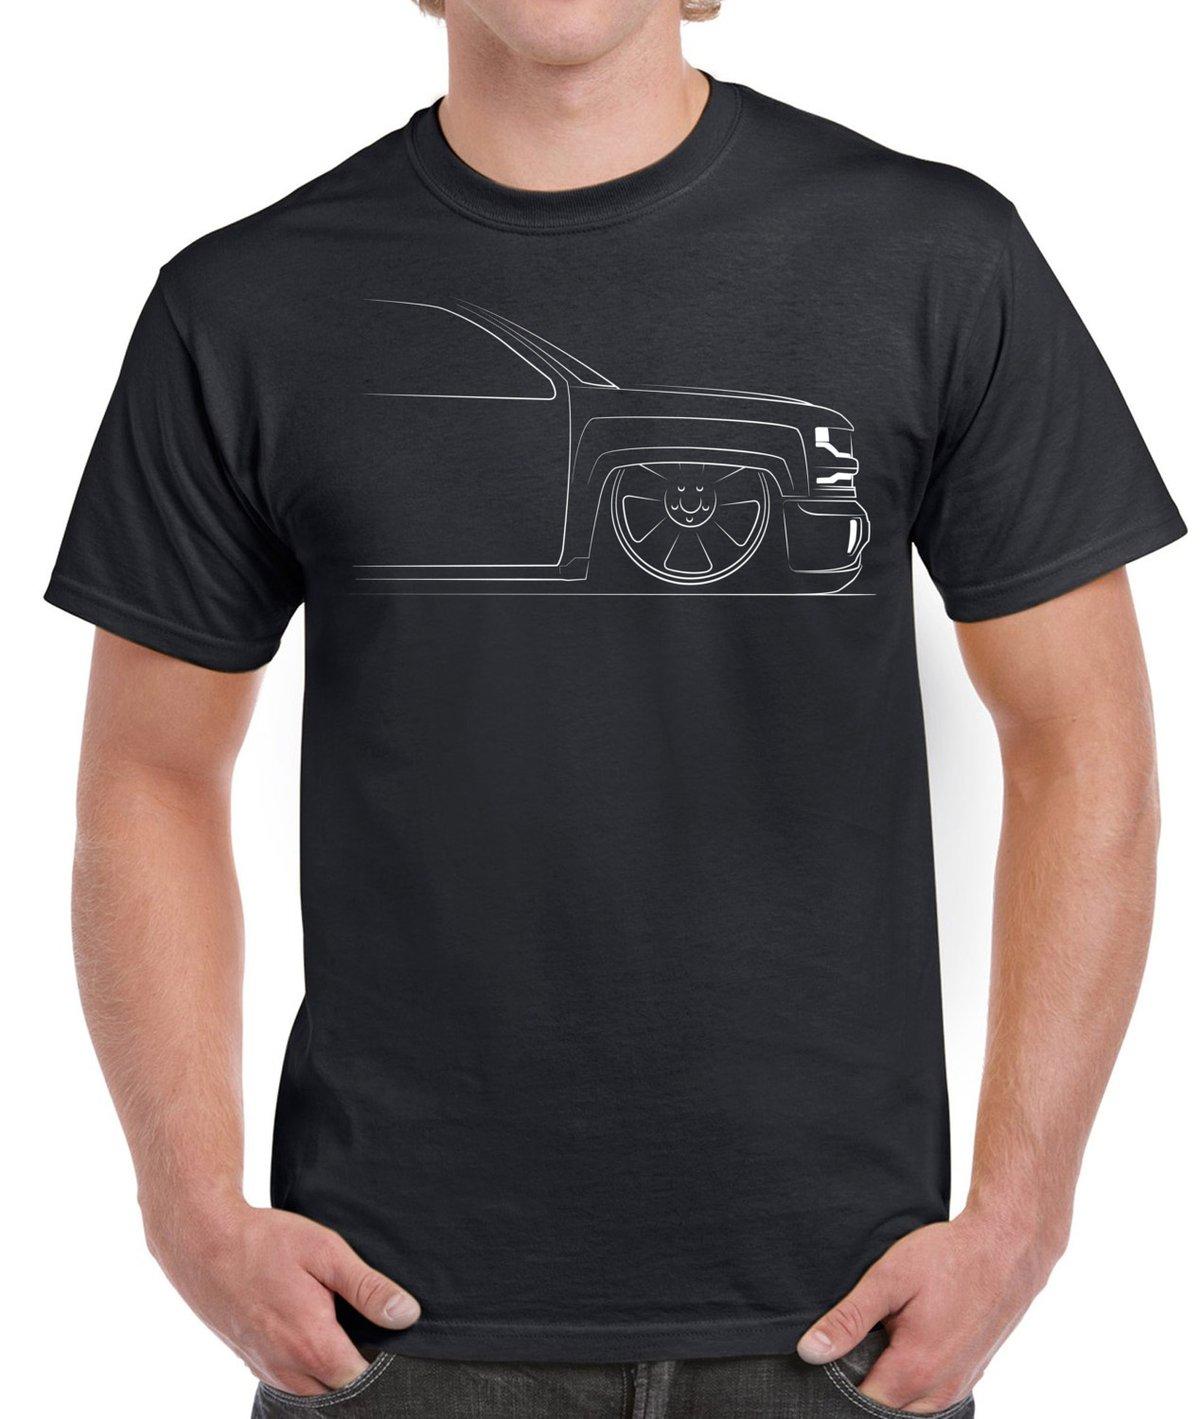 Image of Silverado Shirt